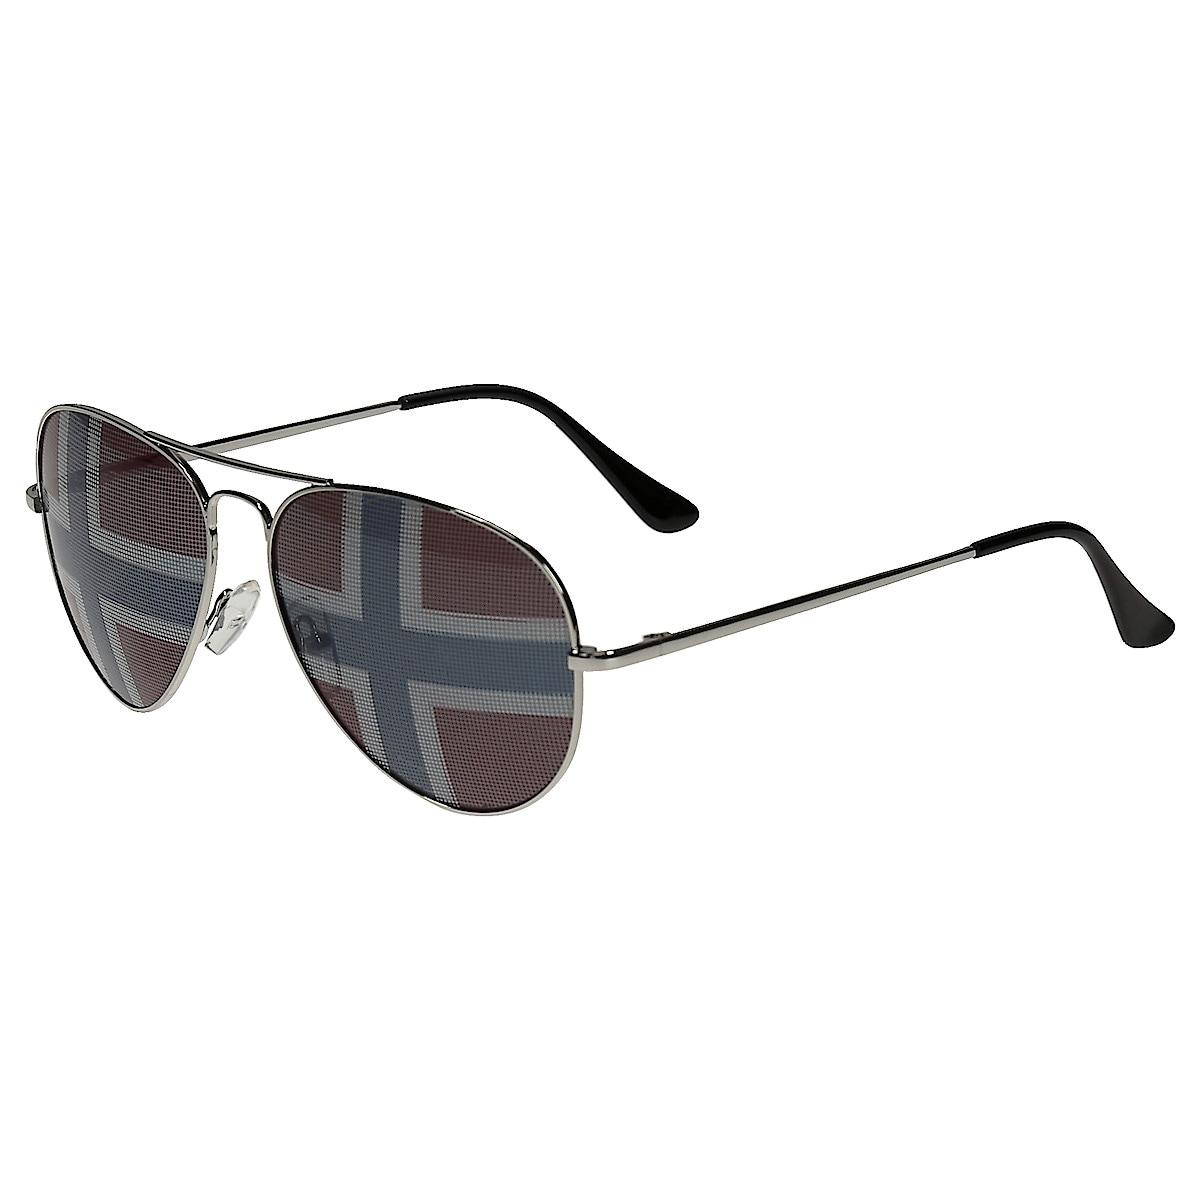 Solbriller med flagg